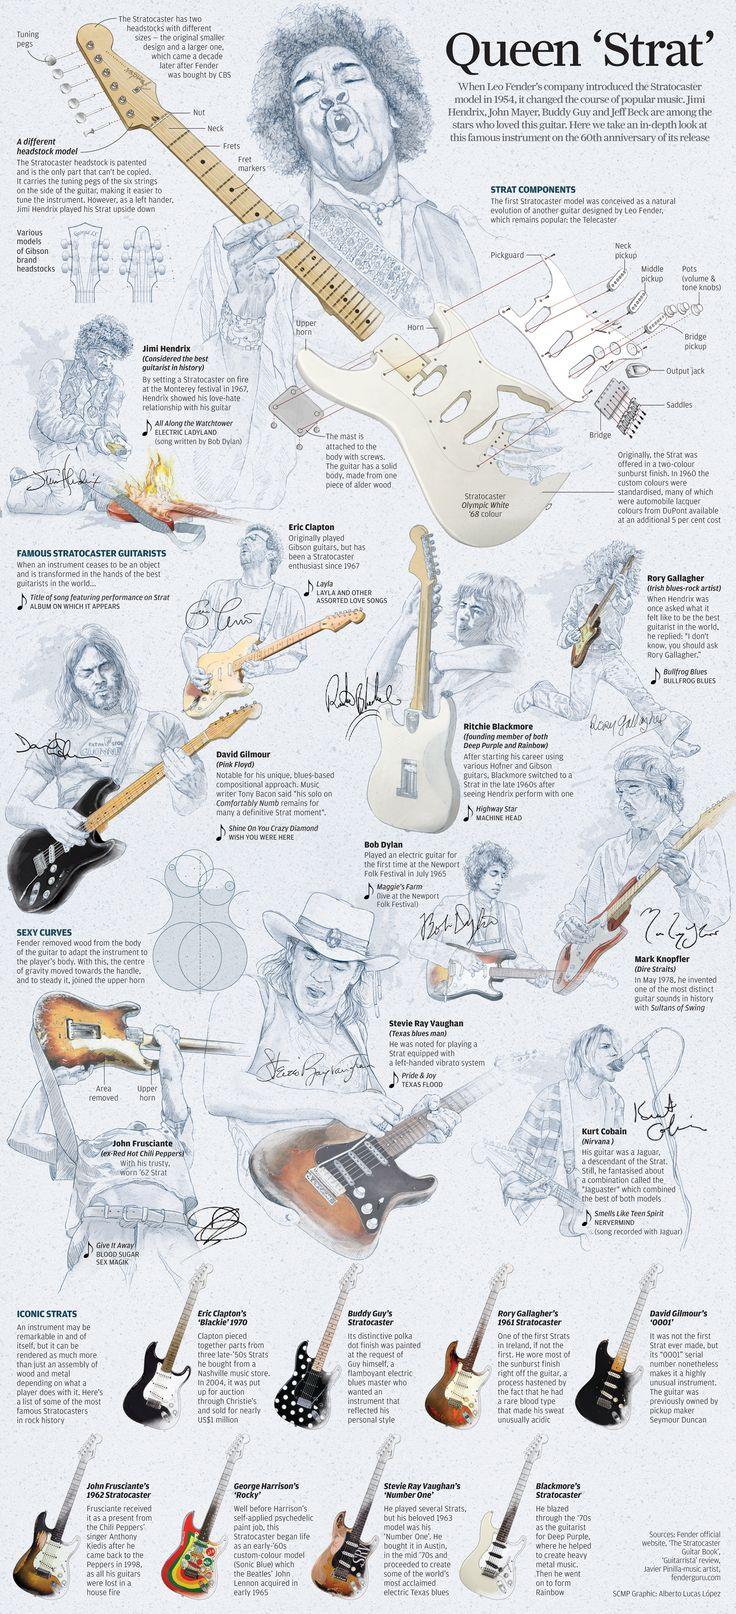 Història de la Fender Stratocaster.